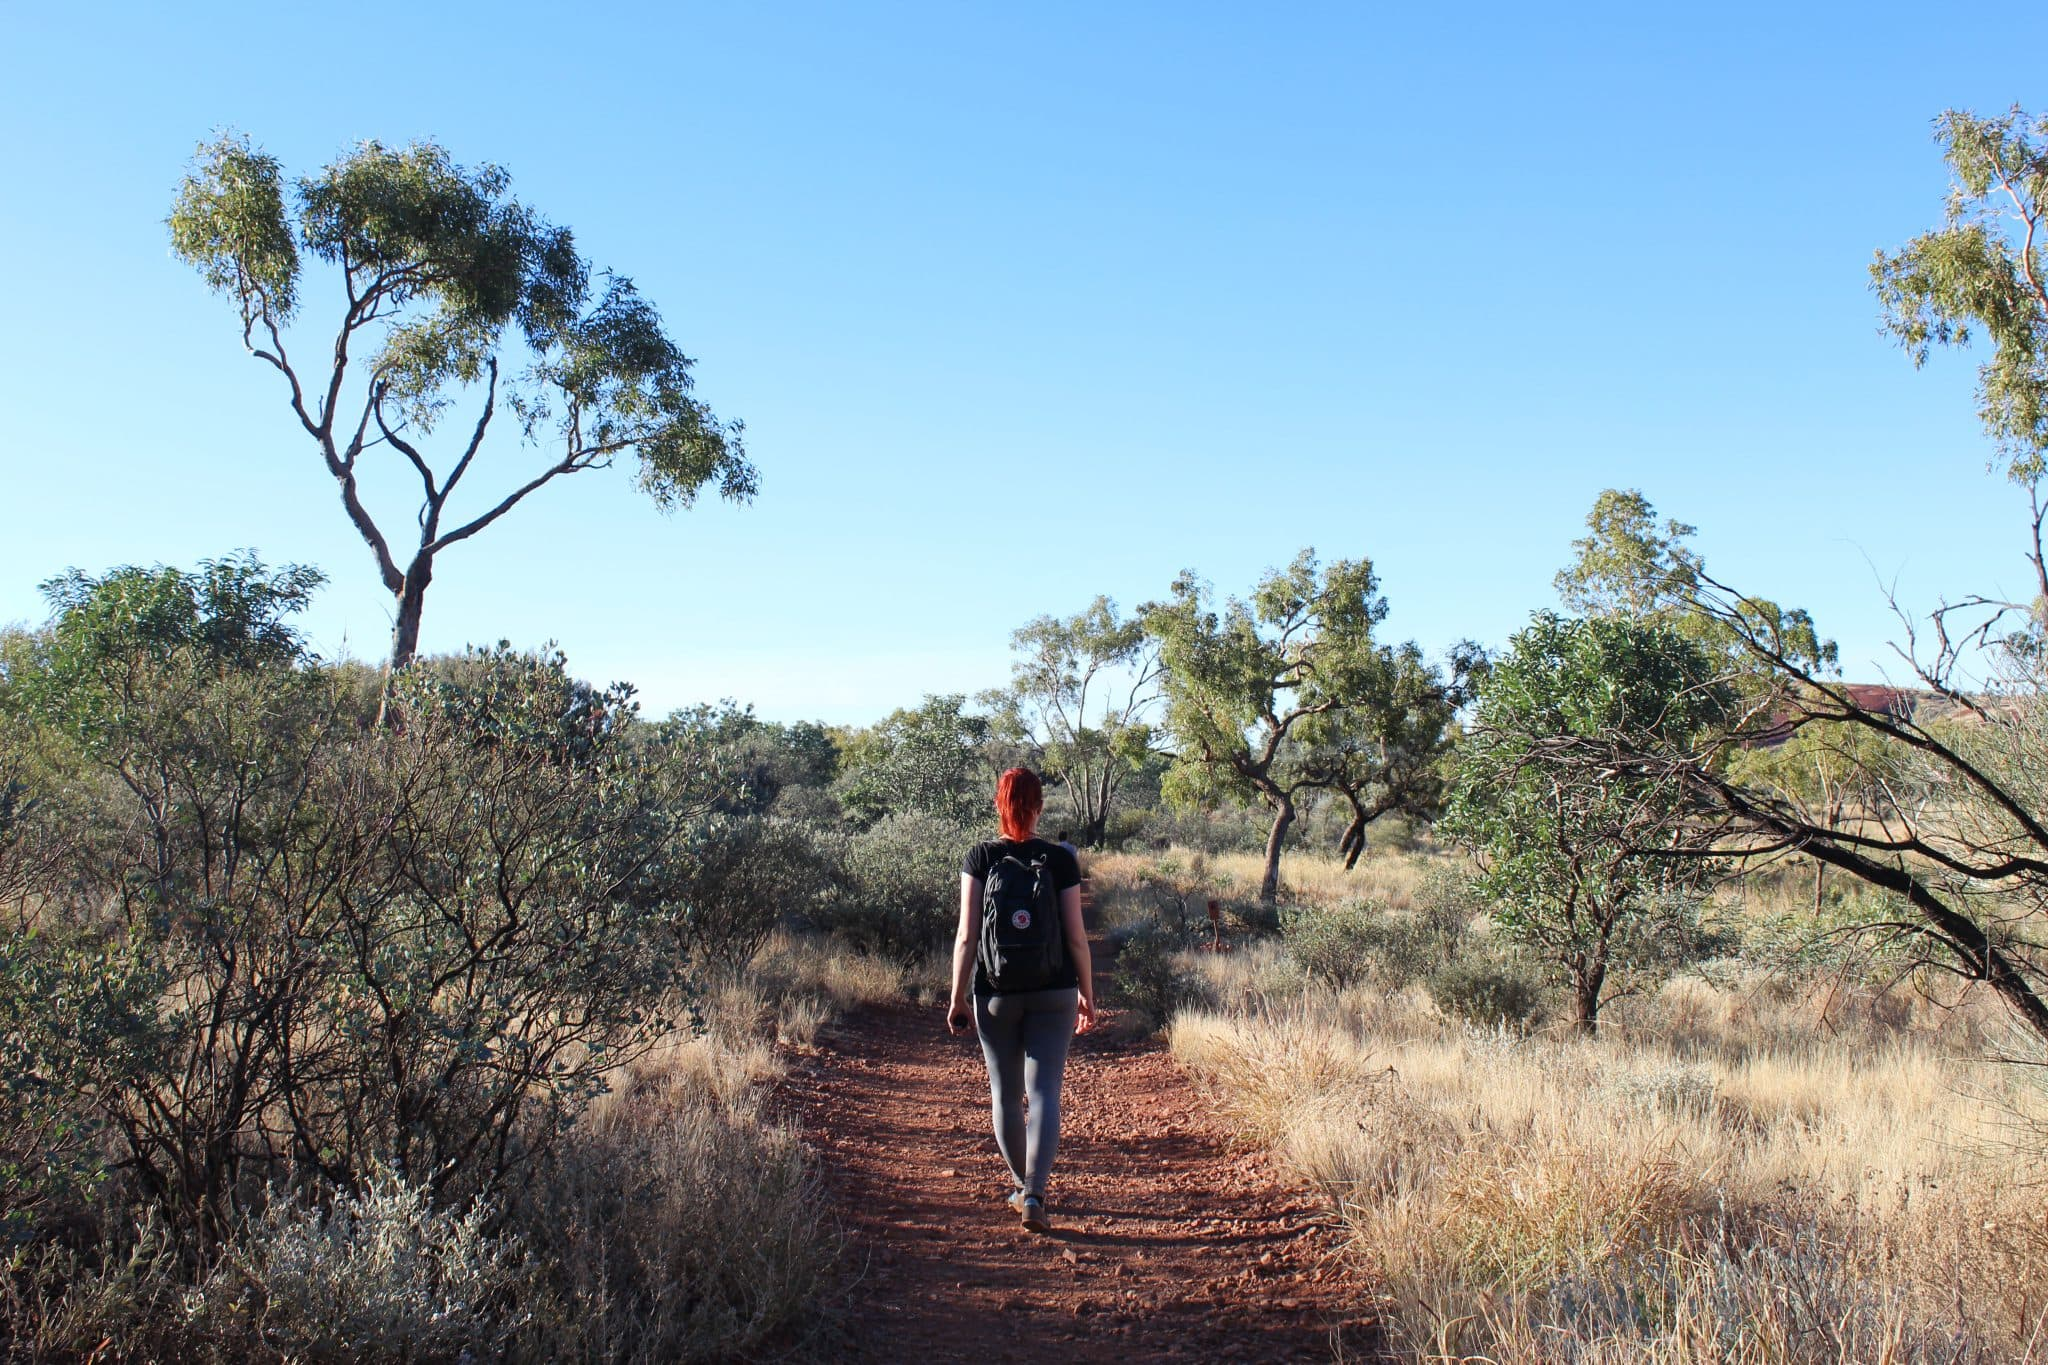 Austrálie withthebagonmyback